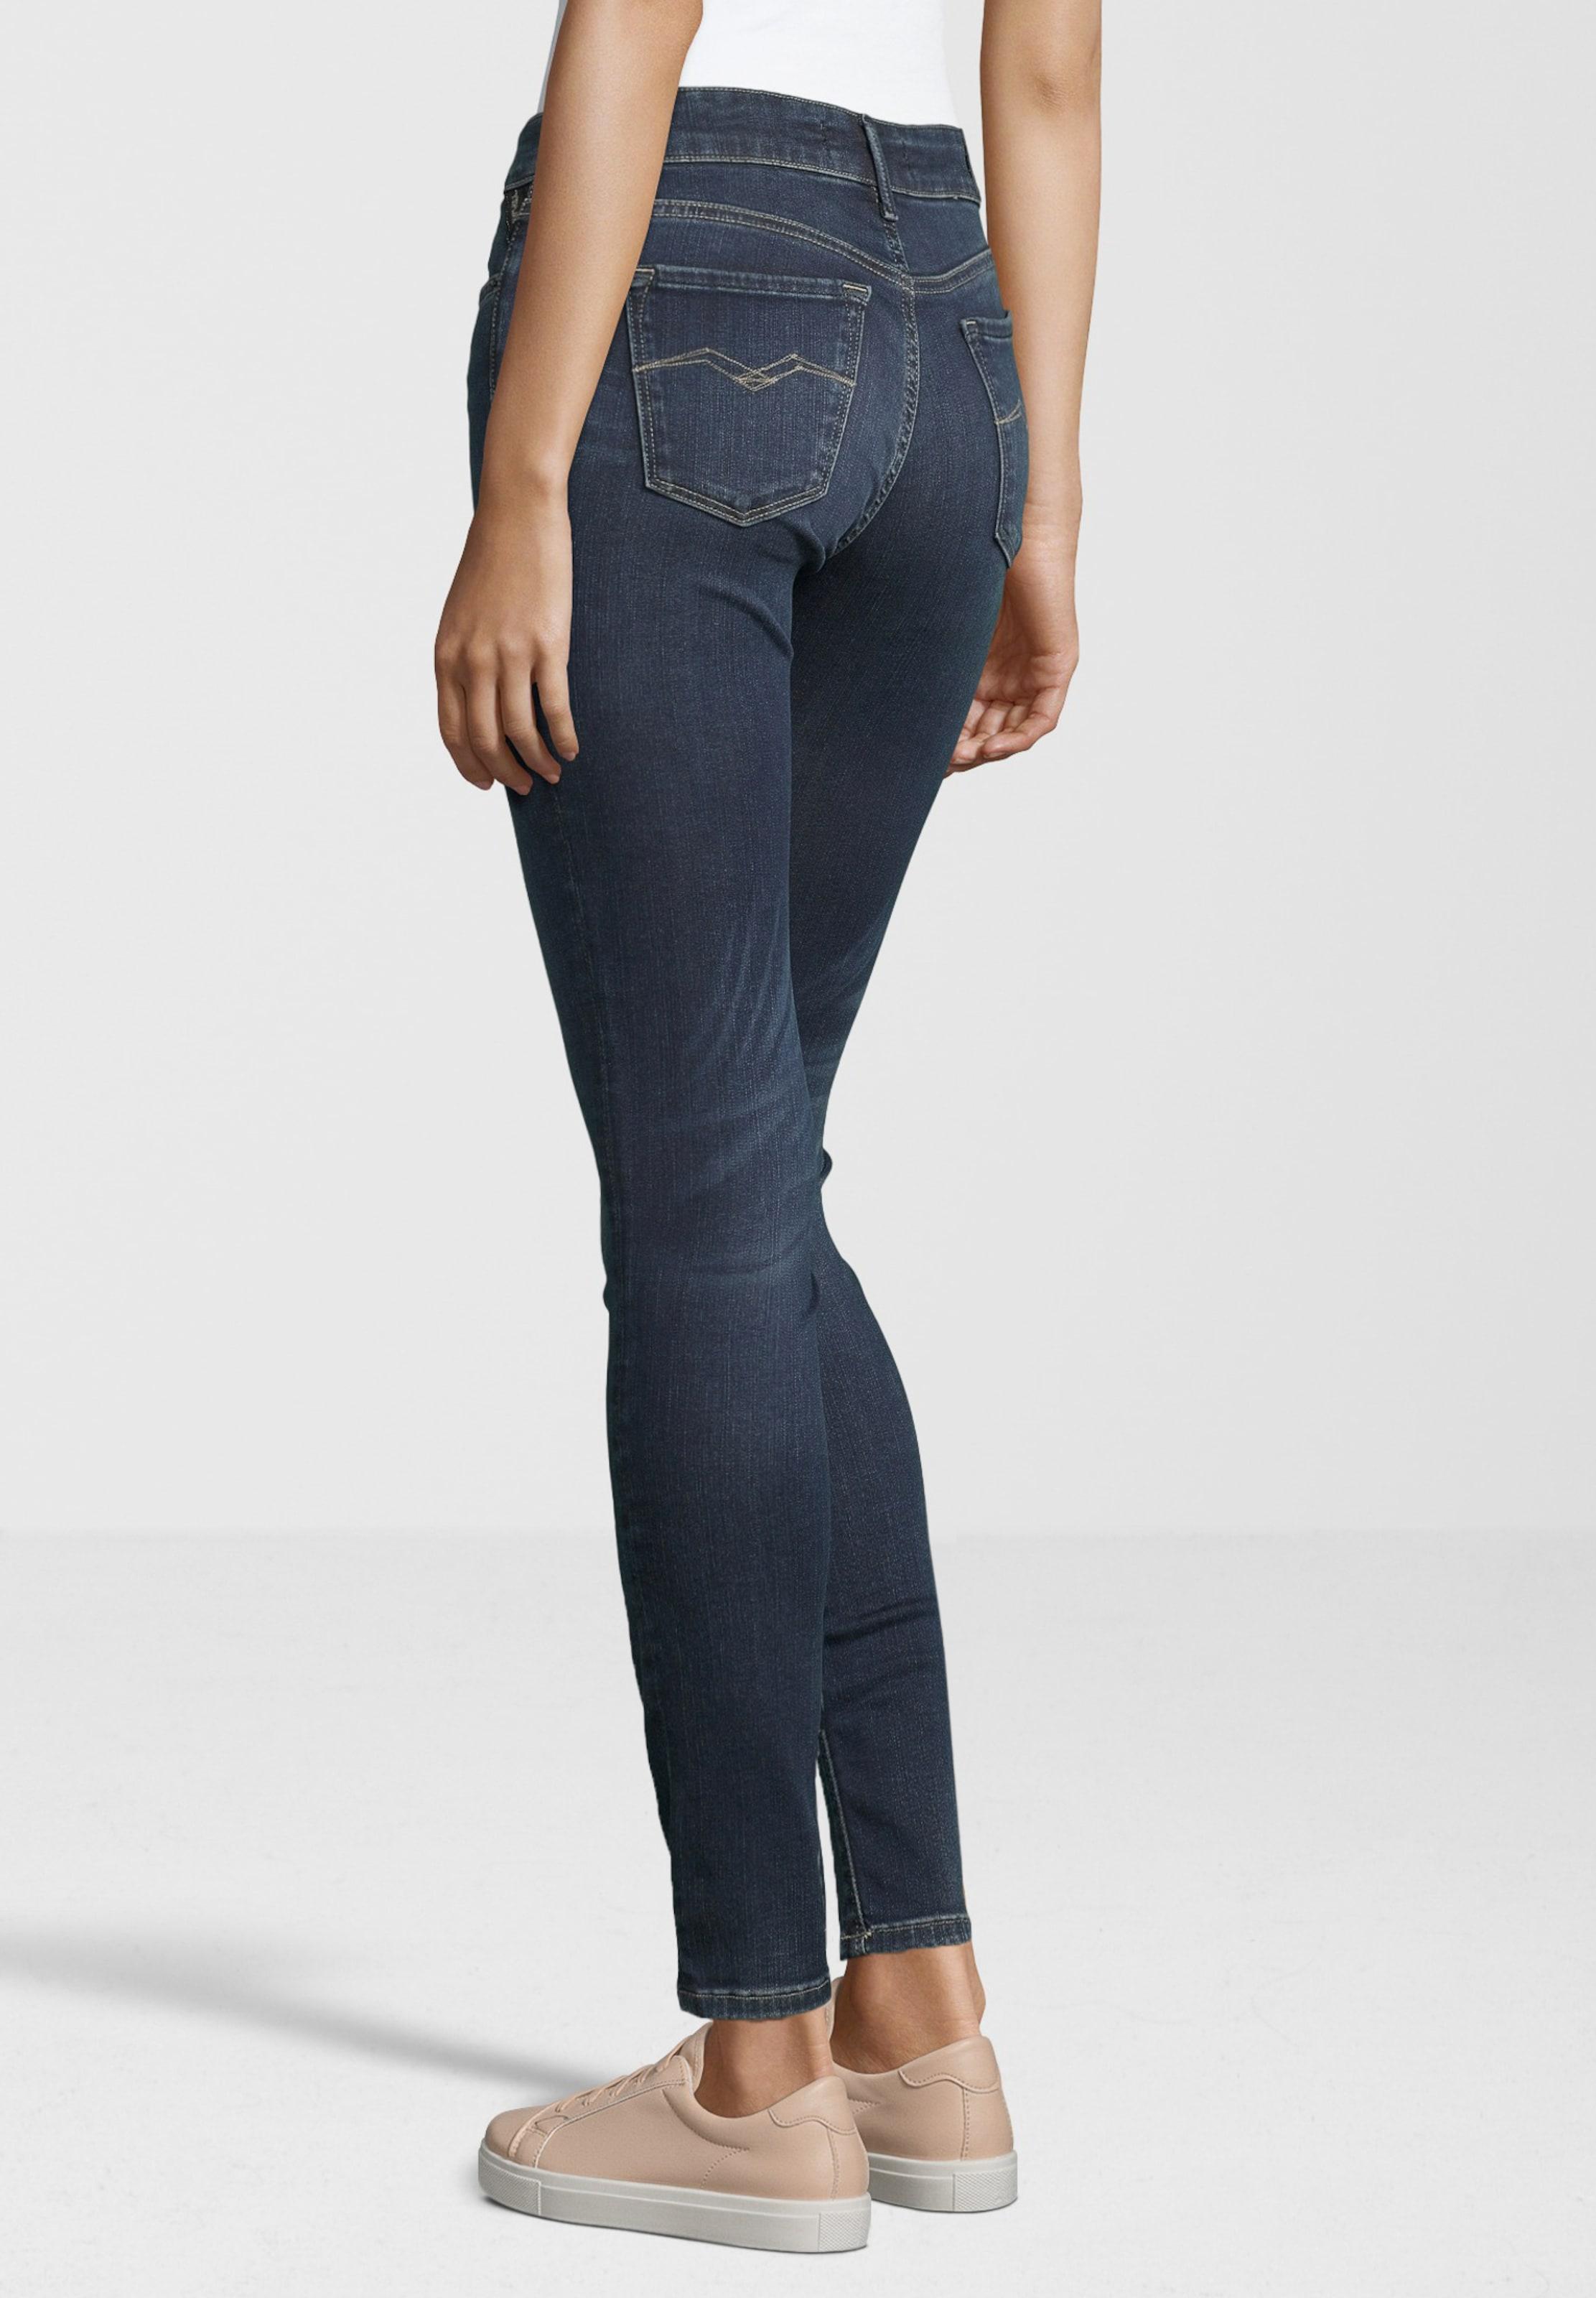 Waist' BlauBlue Jeans 'luz Replay In High Denim qVUzSMp